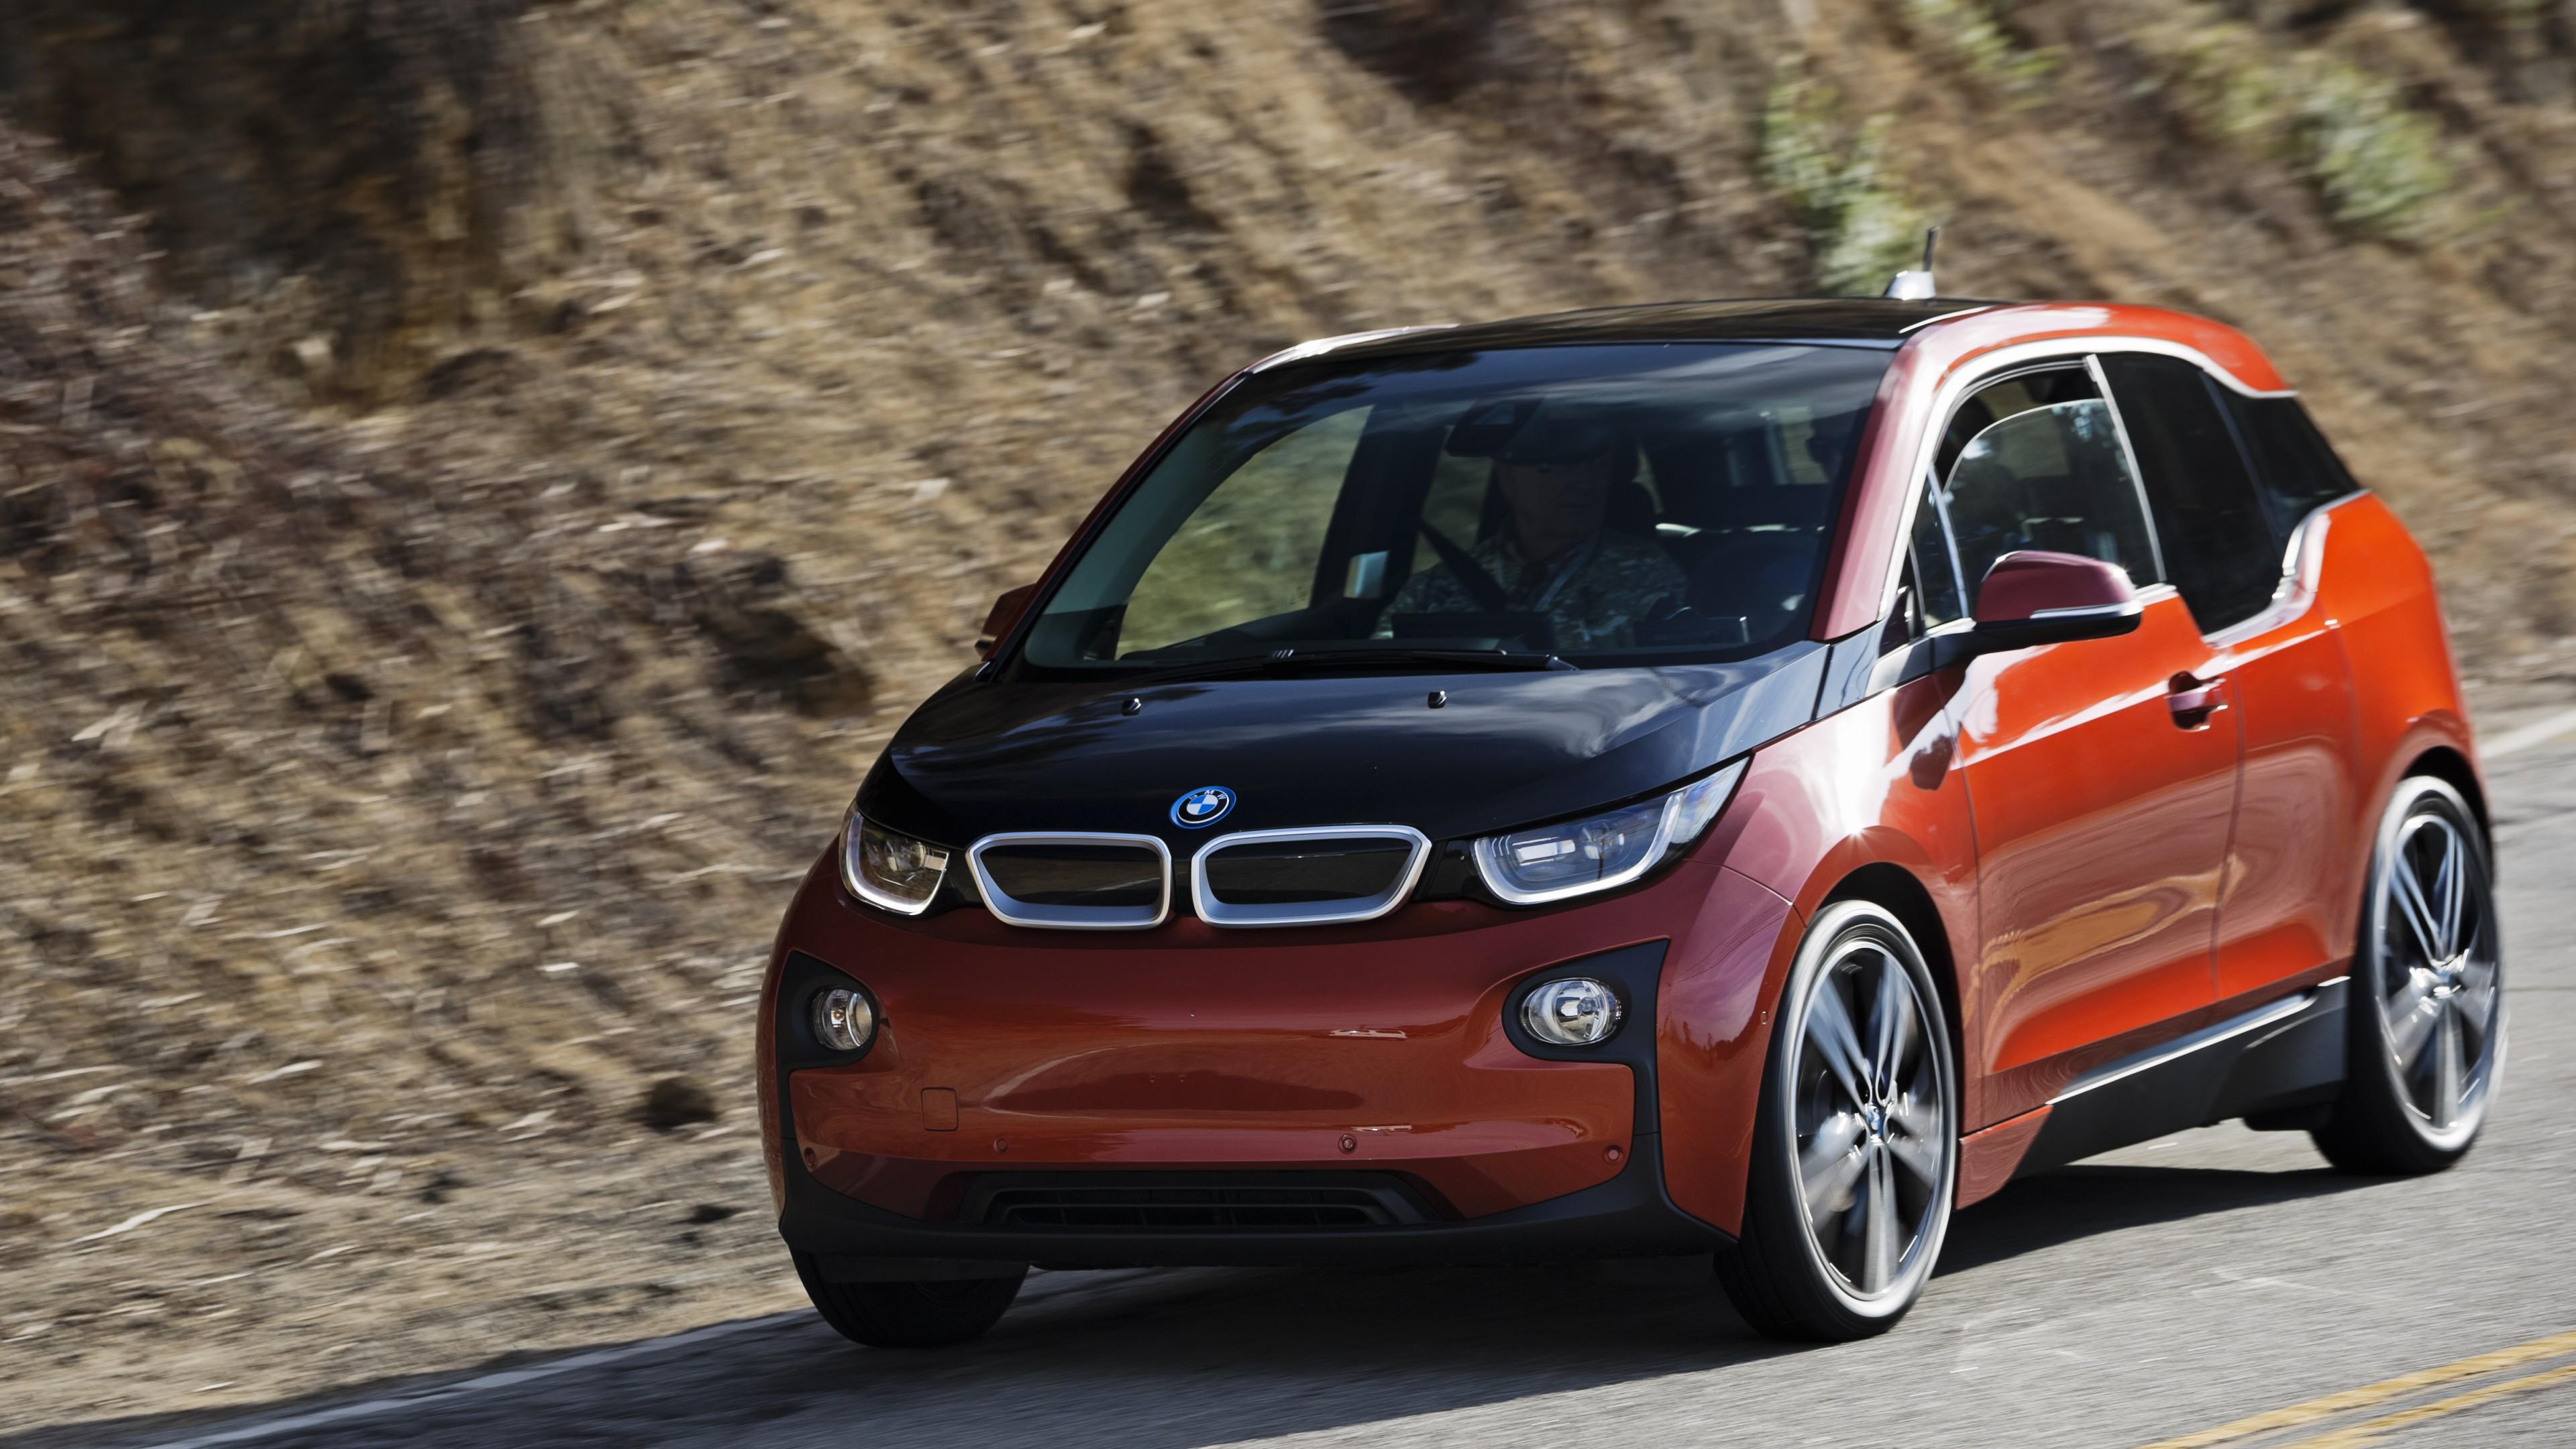 Hyundai >> Wallpaper BMW i3, hybrid, REx, MCV, carbon, city car, BMW